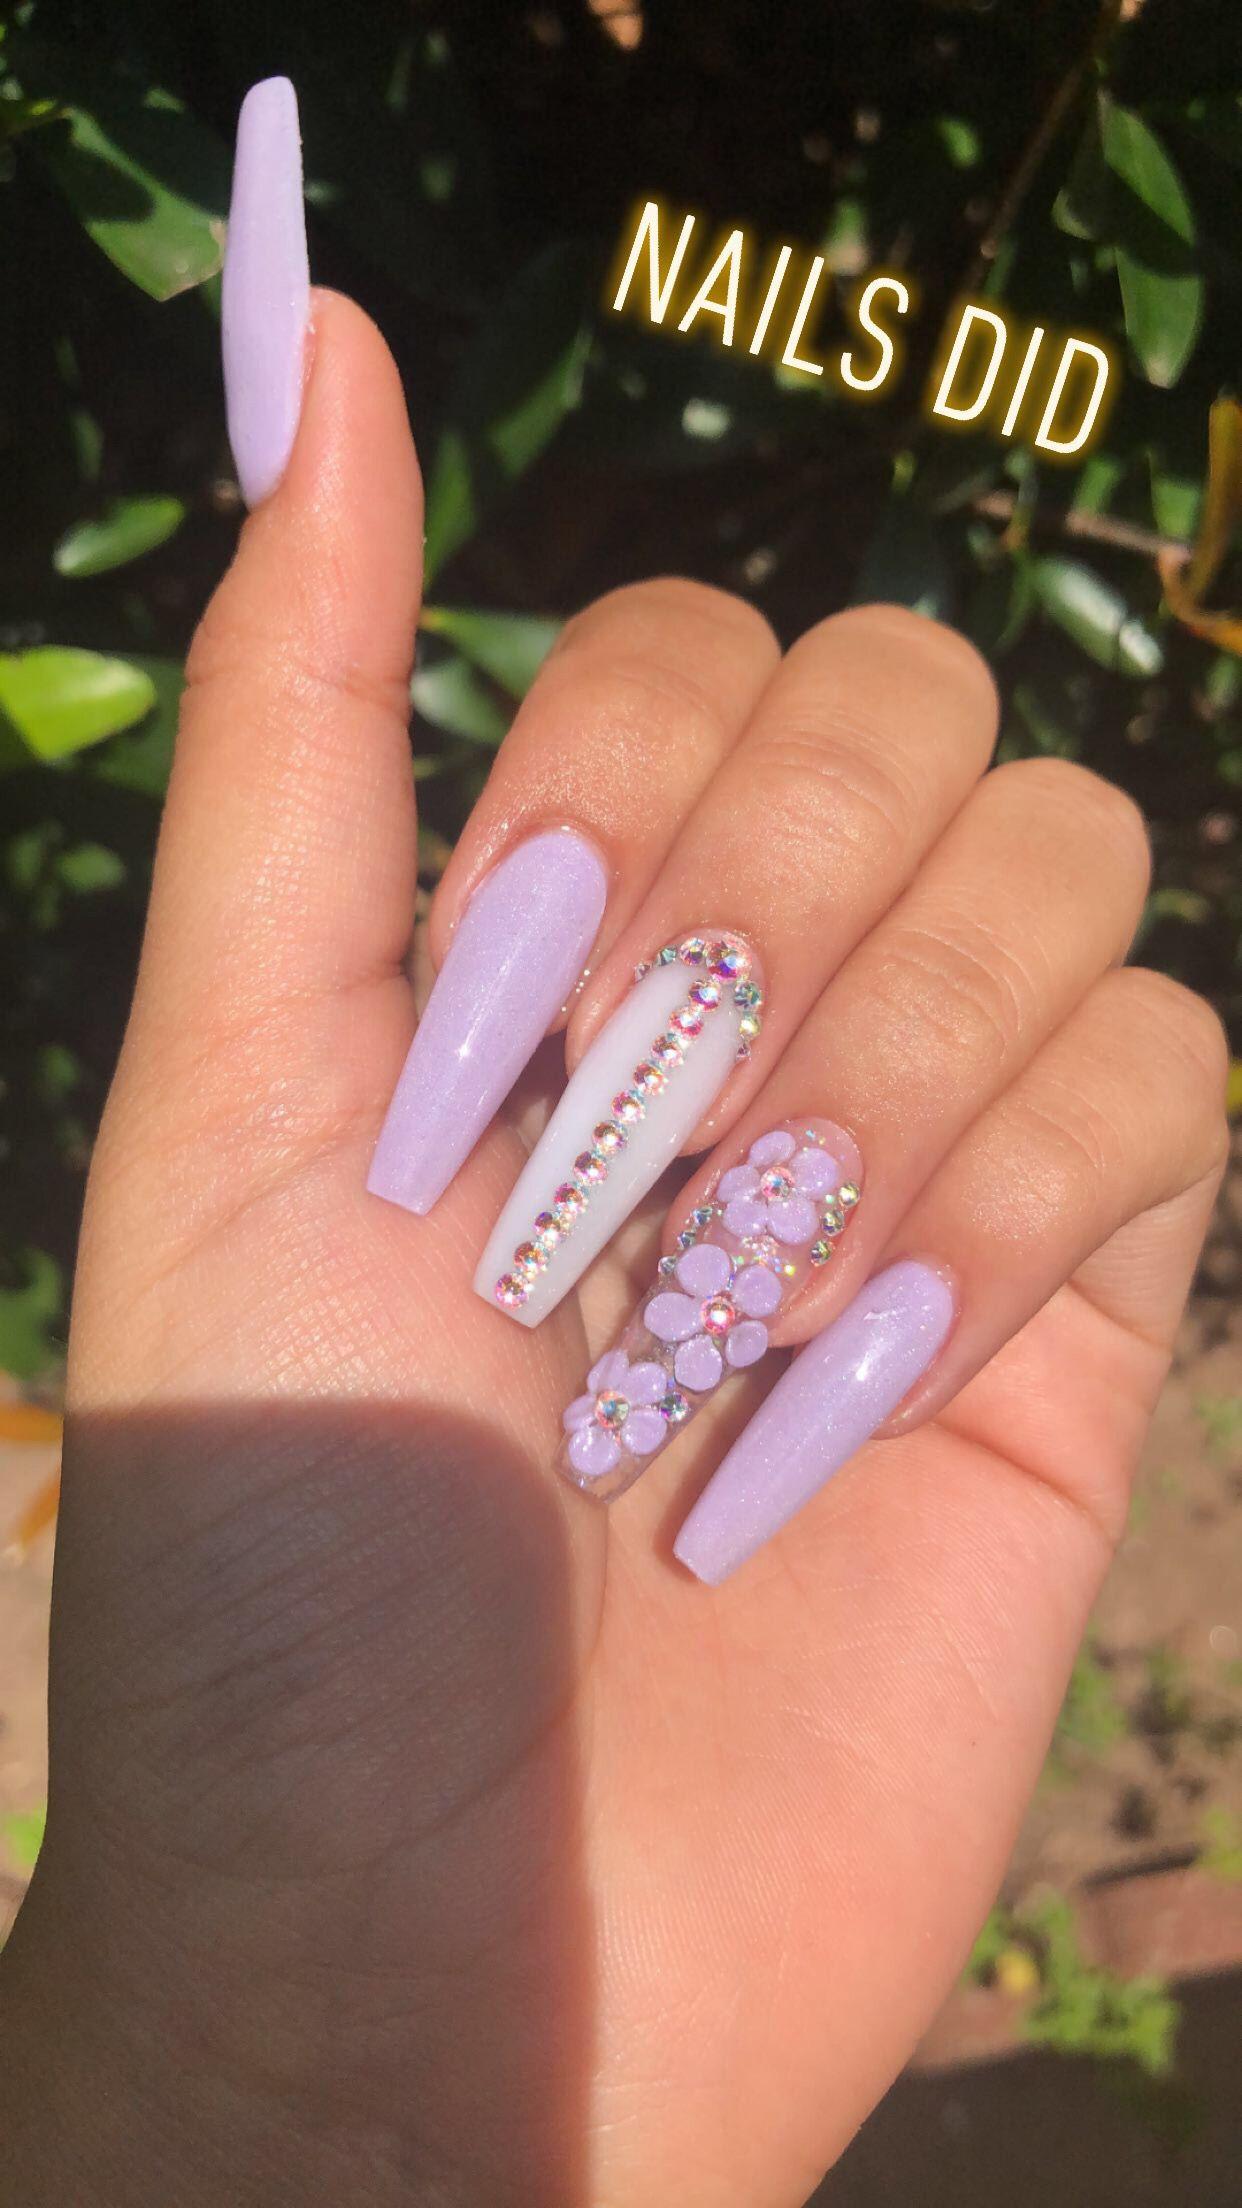 Stunning Lilac Acrylic Nails Nail Art Mermaid Glitter Purple Flowers Chrome Acrylics Shiny Gel Polish Nails Hot Nails Acrylic Nails